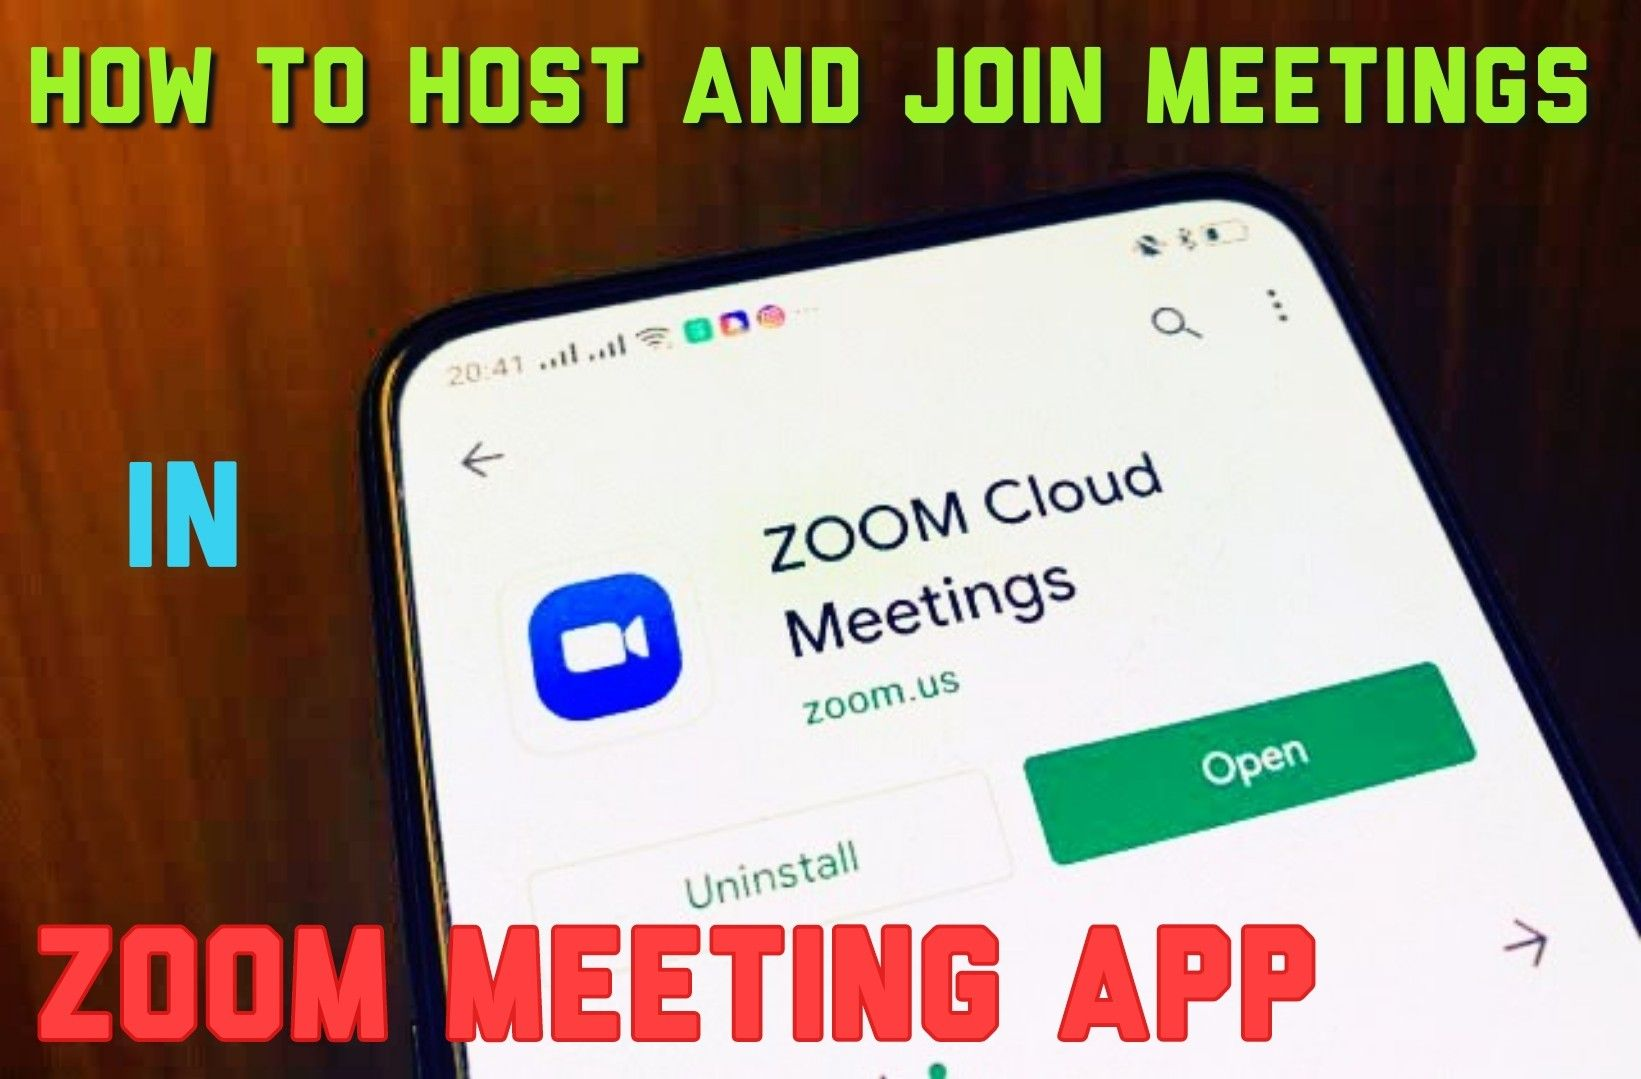 How To Use Zoom Meetings App On Android Host And Join Meetings Zoom Meeting App Join Meeting Zoom Cloud Meetings